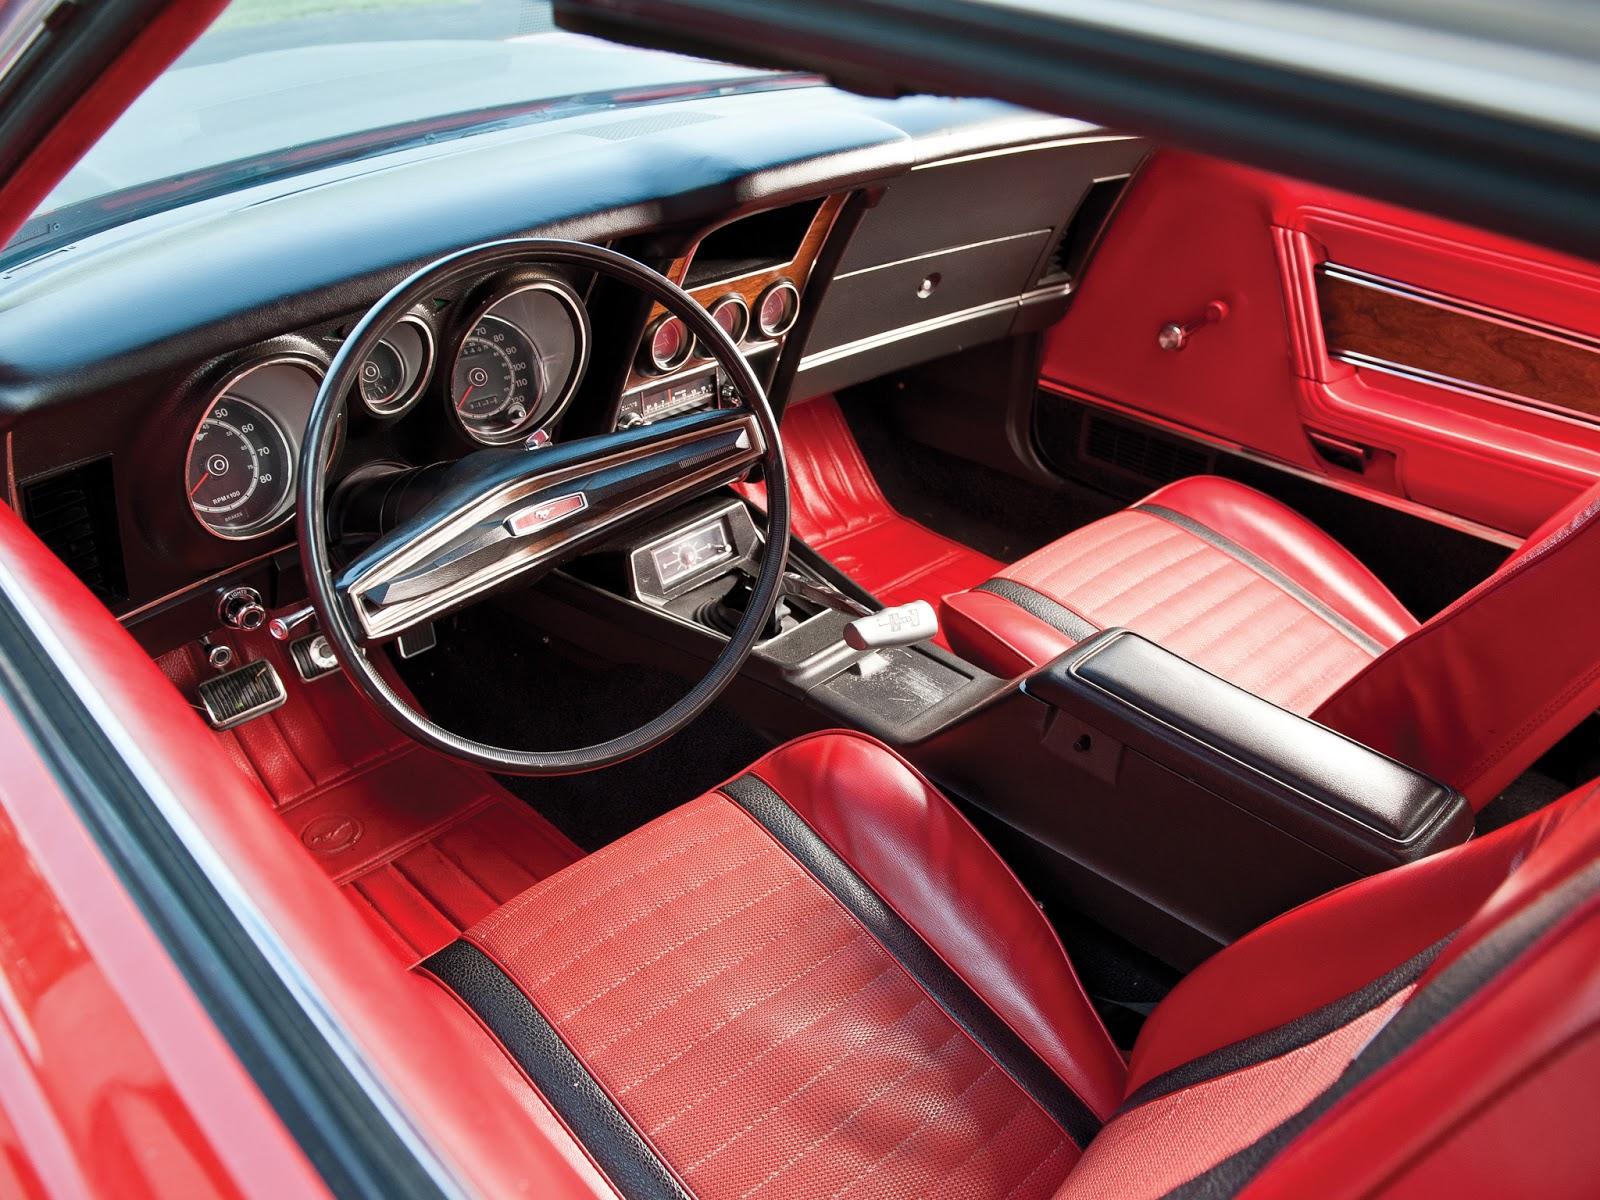 Mustang Cobra Jet >> FAB WHEELS DIGEST (F.W.D.): Ford Mustang Mach 1 - 2nd Gen ...